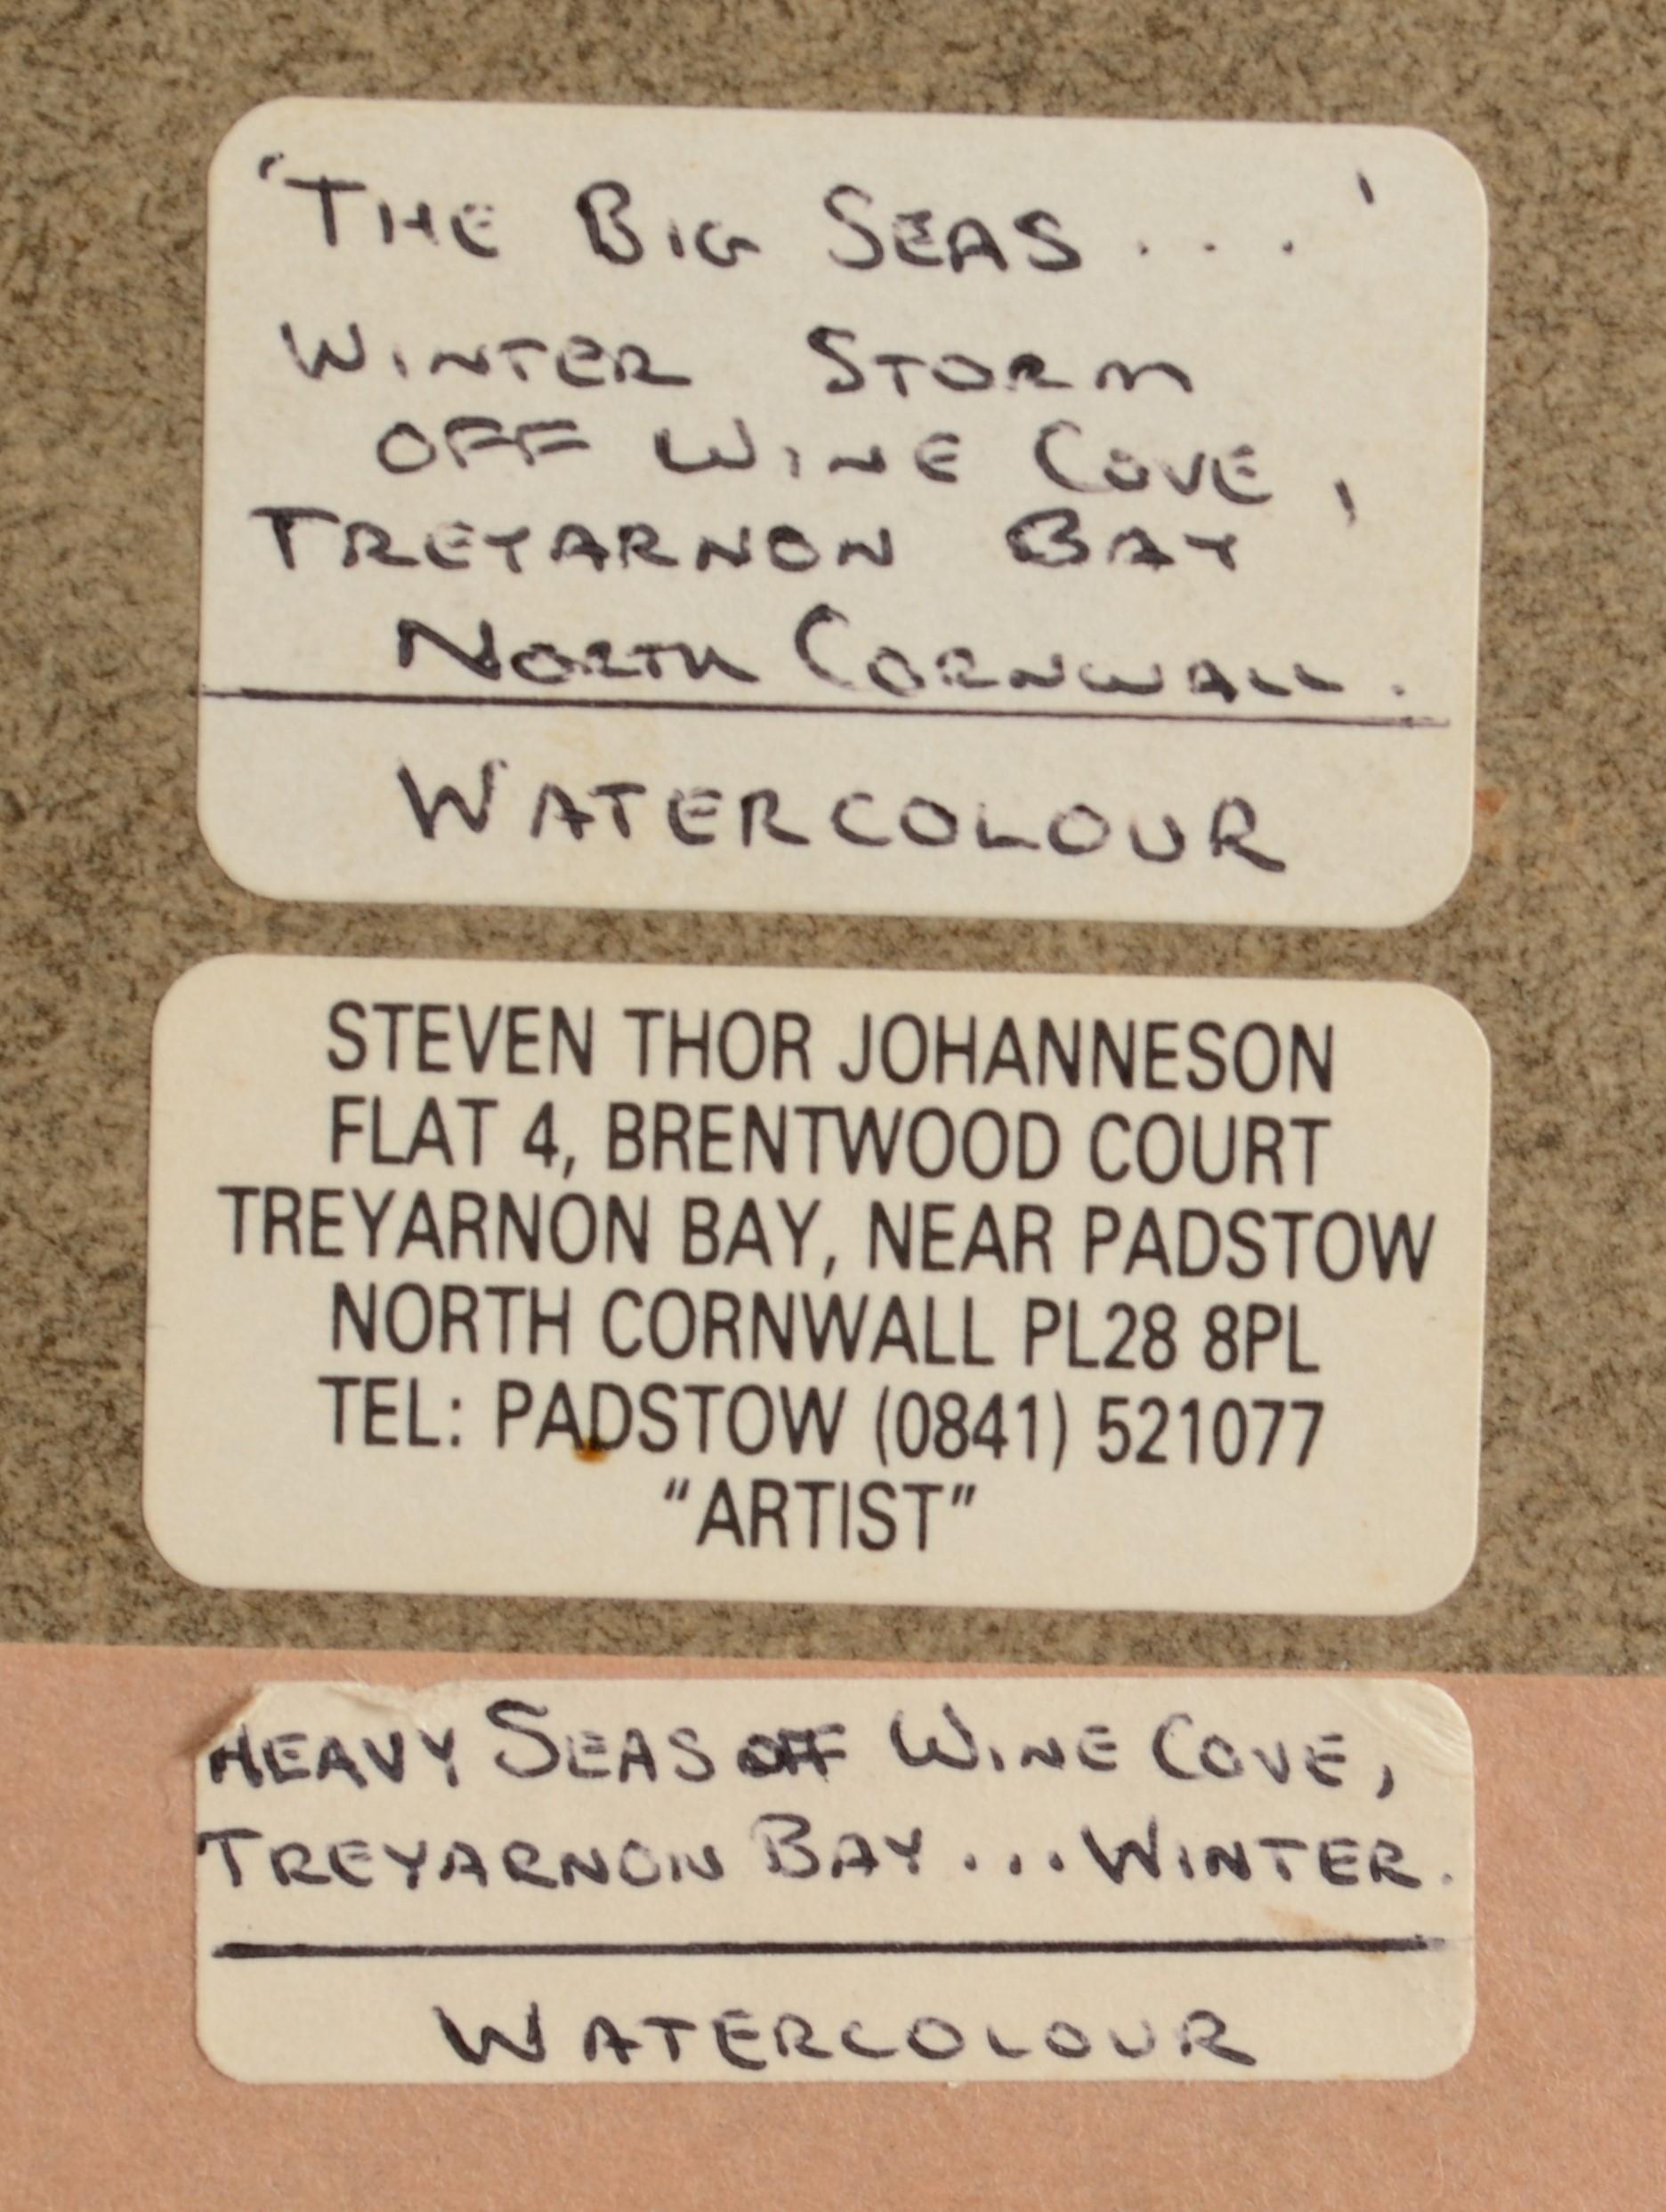 Lot 32 - STEPHEN THOR JOHANNESSON The Big Seas, Treyarnon Bay,